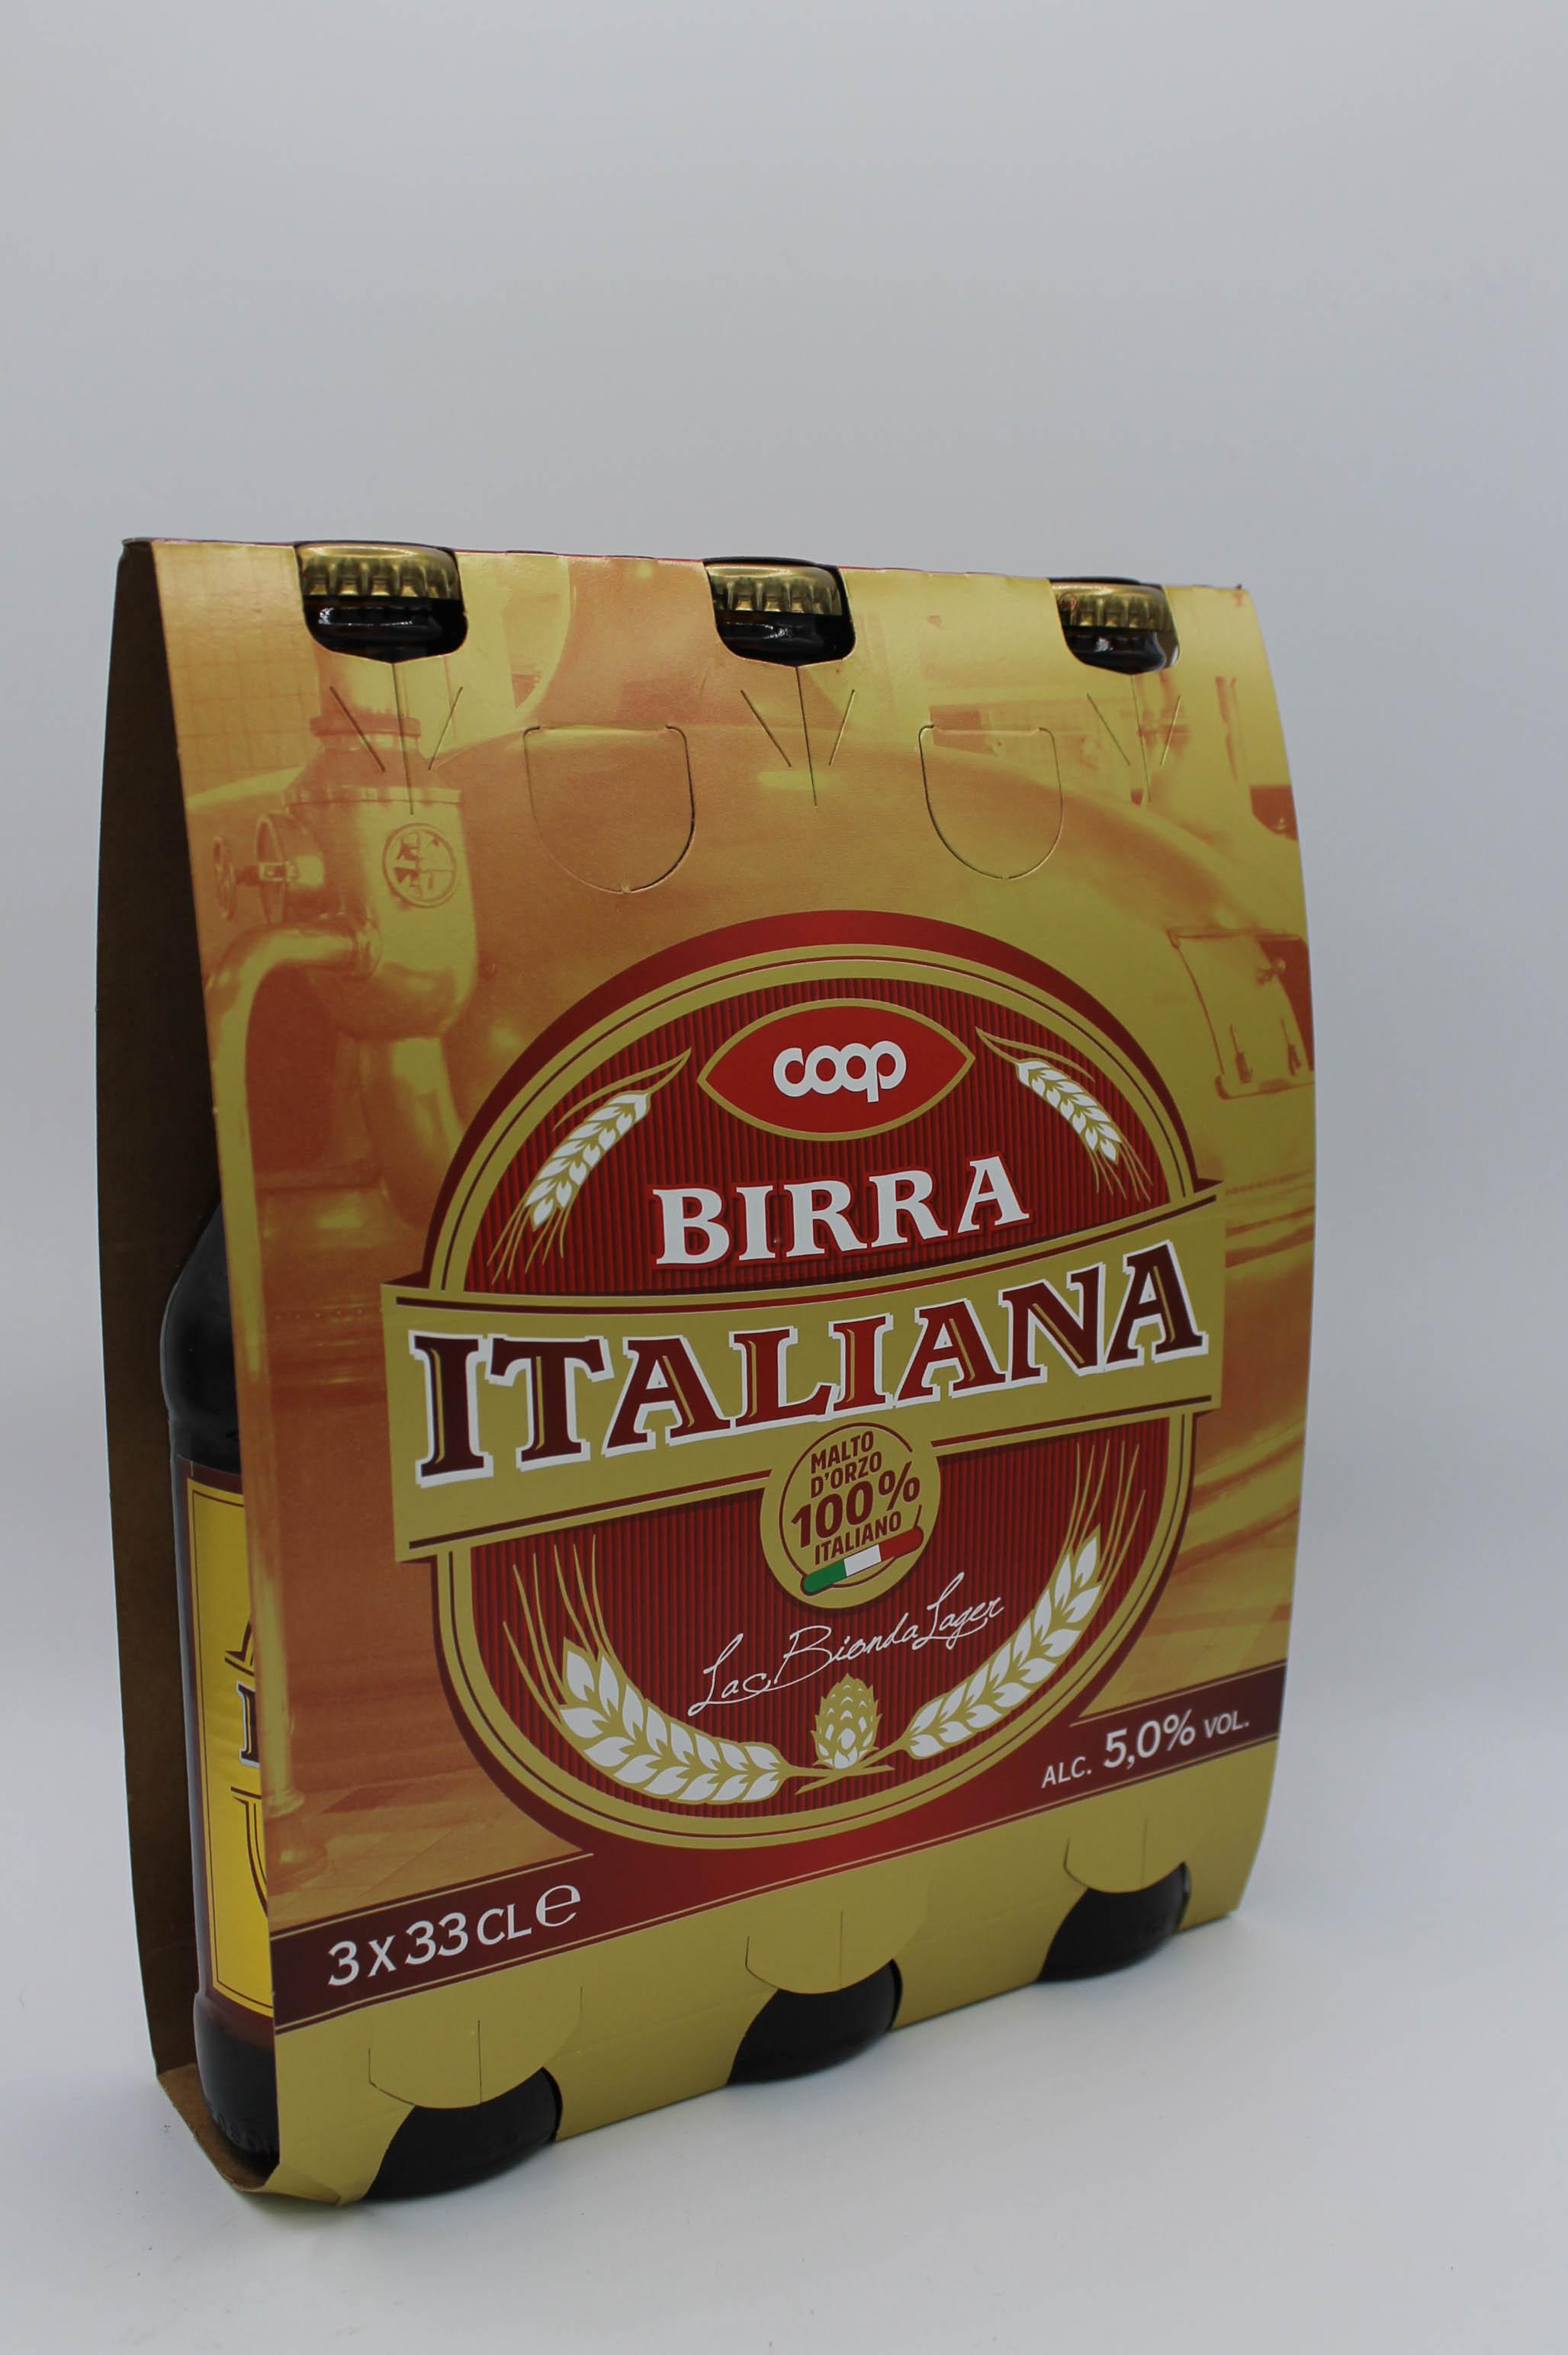 Coop birra italiana 3x330ml vari gusti.